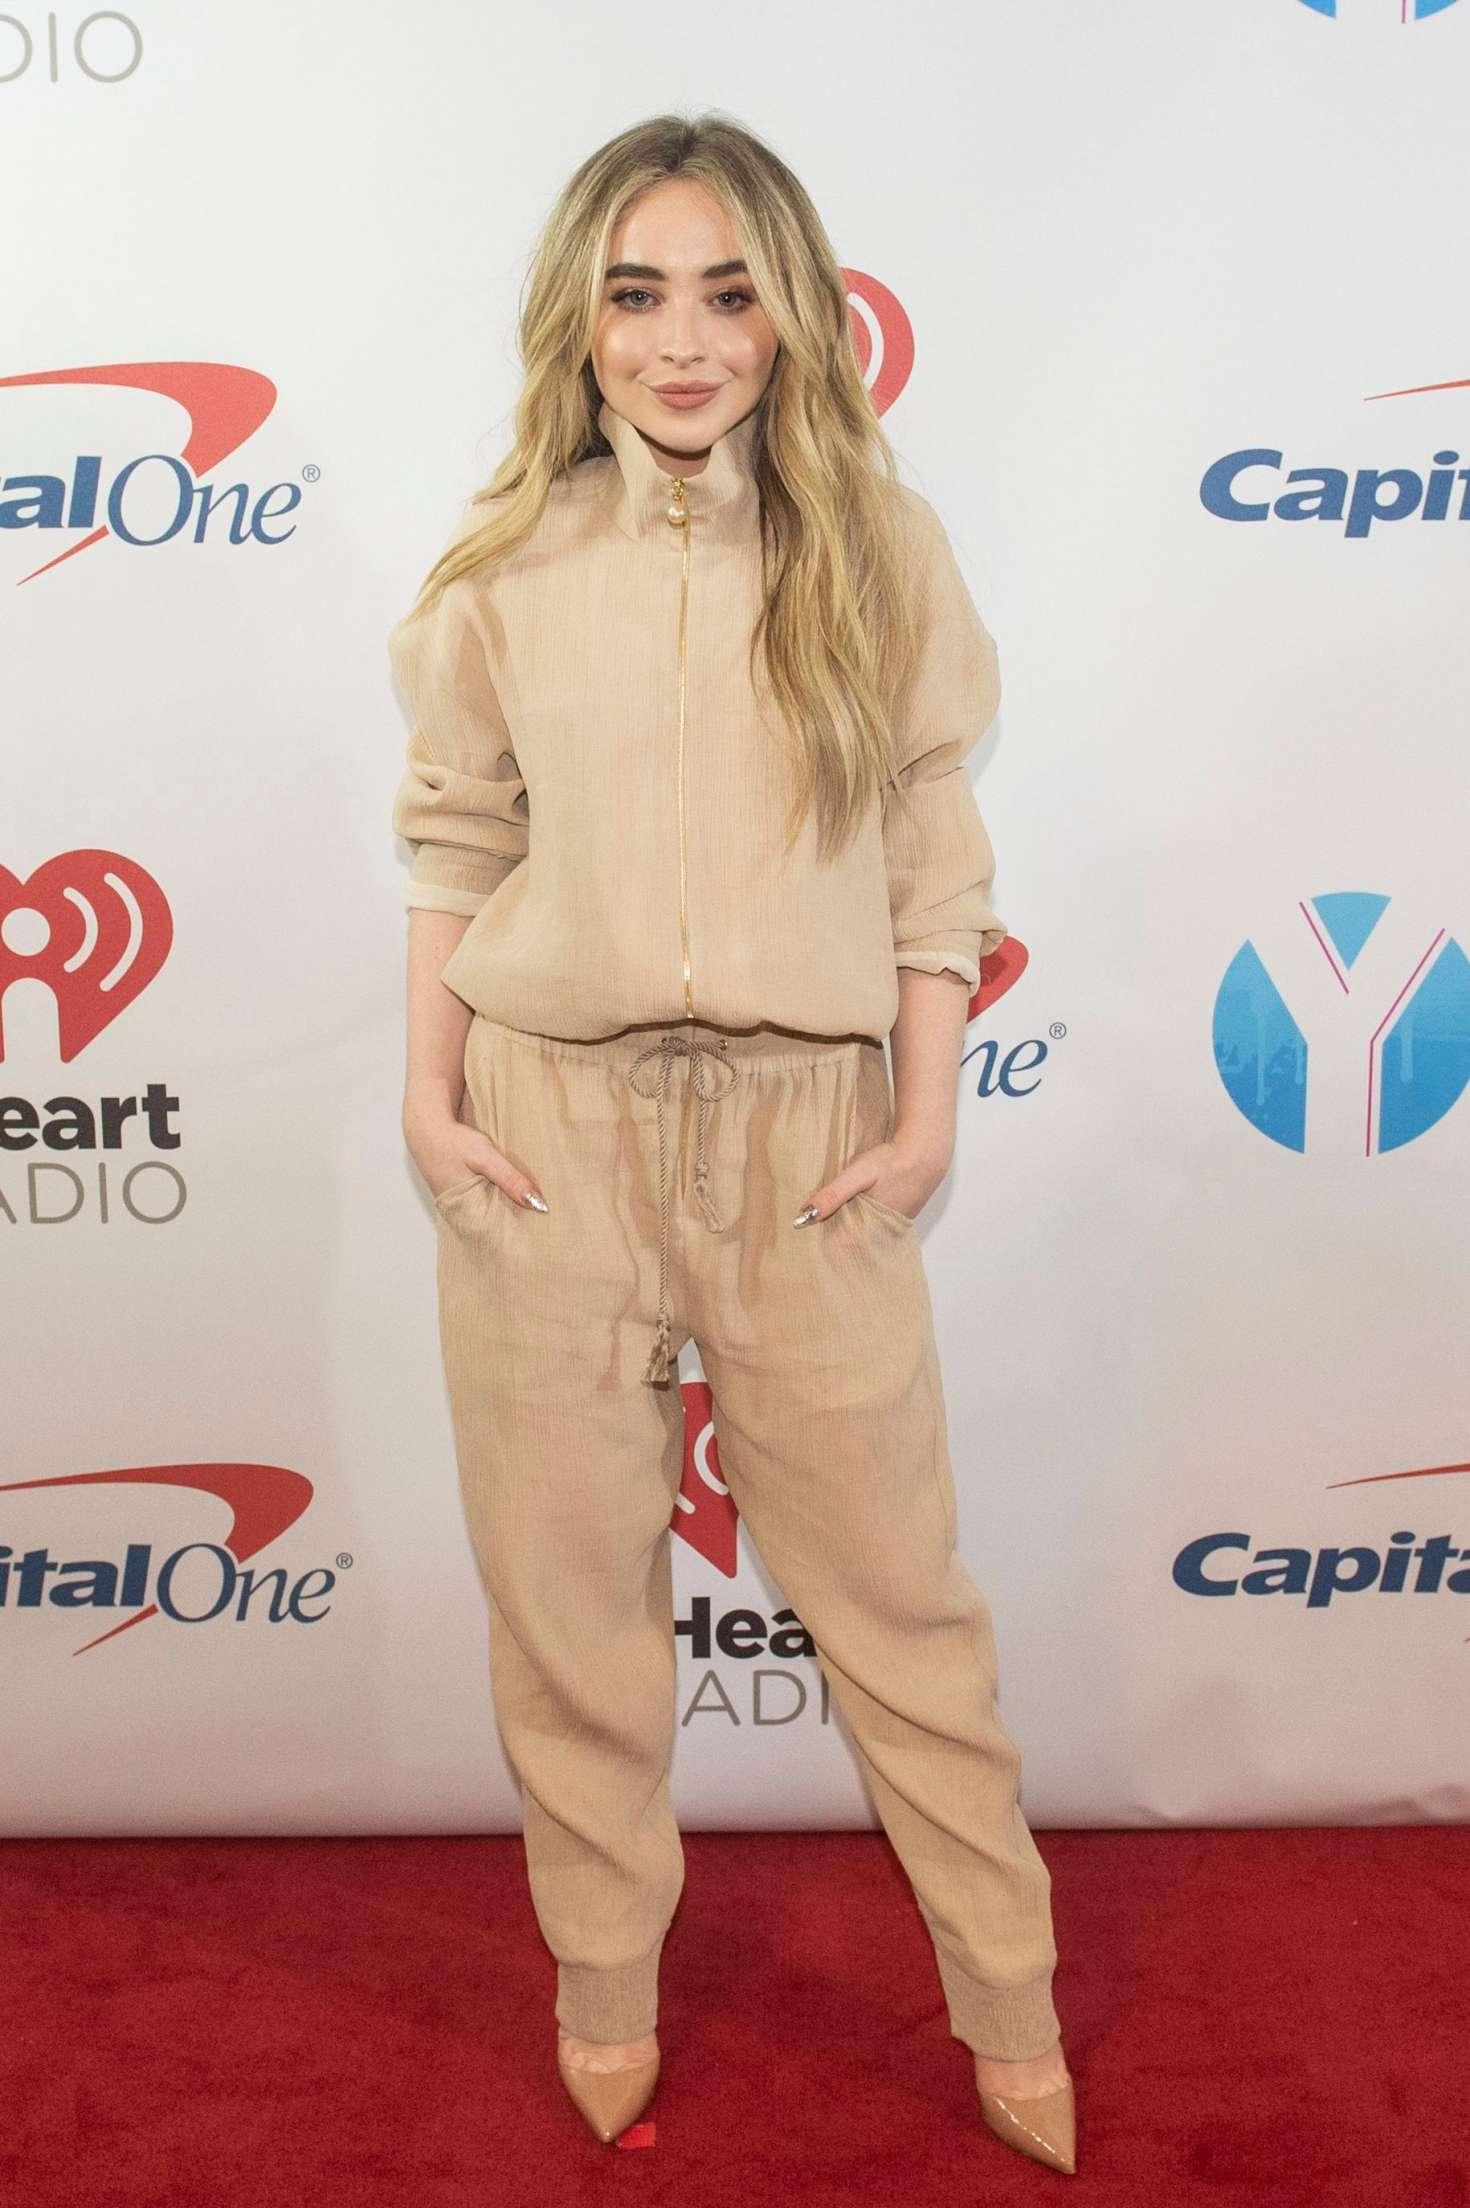 Sabrina Carpenter 2018 : Sabrina Carpenter: Y100s iHeartRadio Jingle Ball 2018 -03